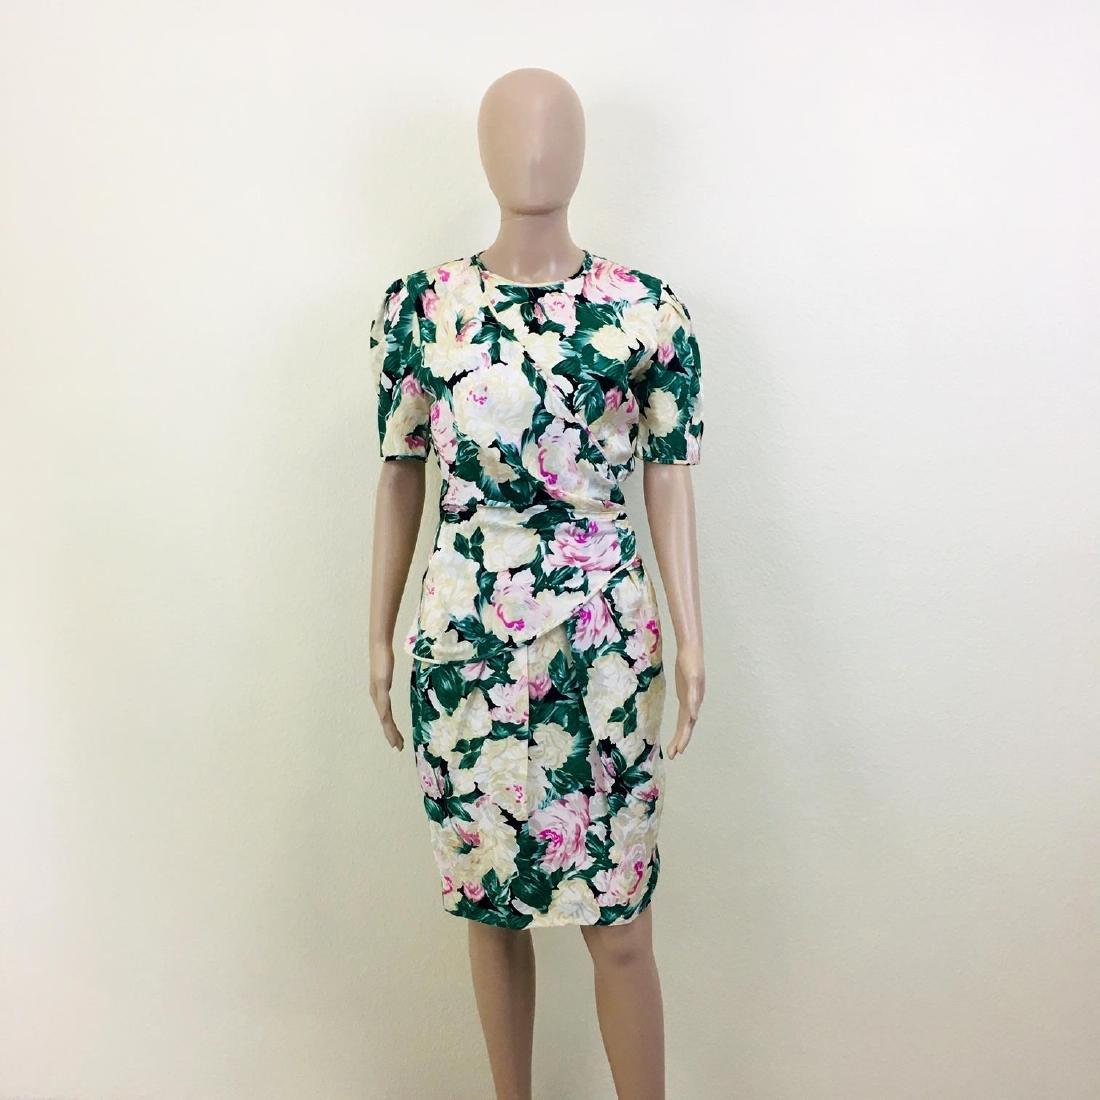 Vintage Women's Maggy London 100% Silk Dress